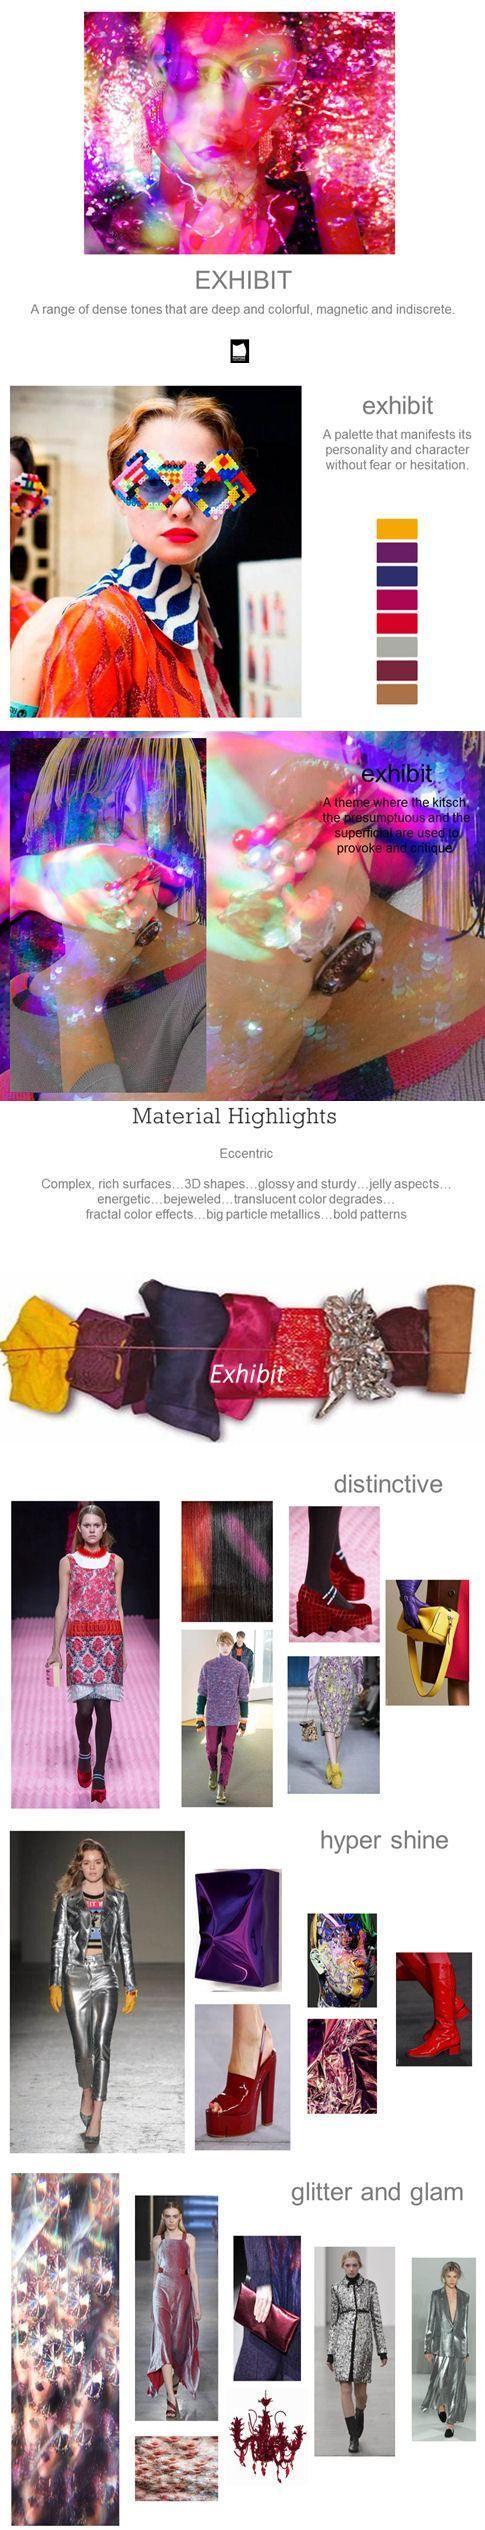 7 best Trends images on Pinterest | Design trends, Blogging and ...